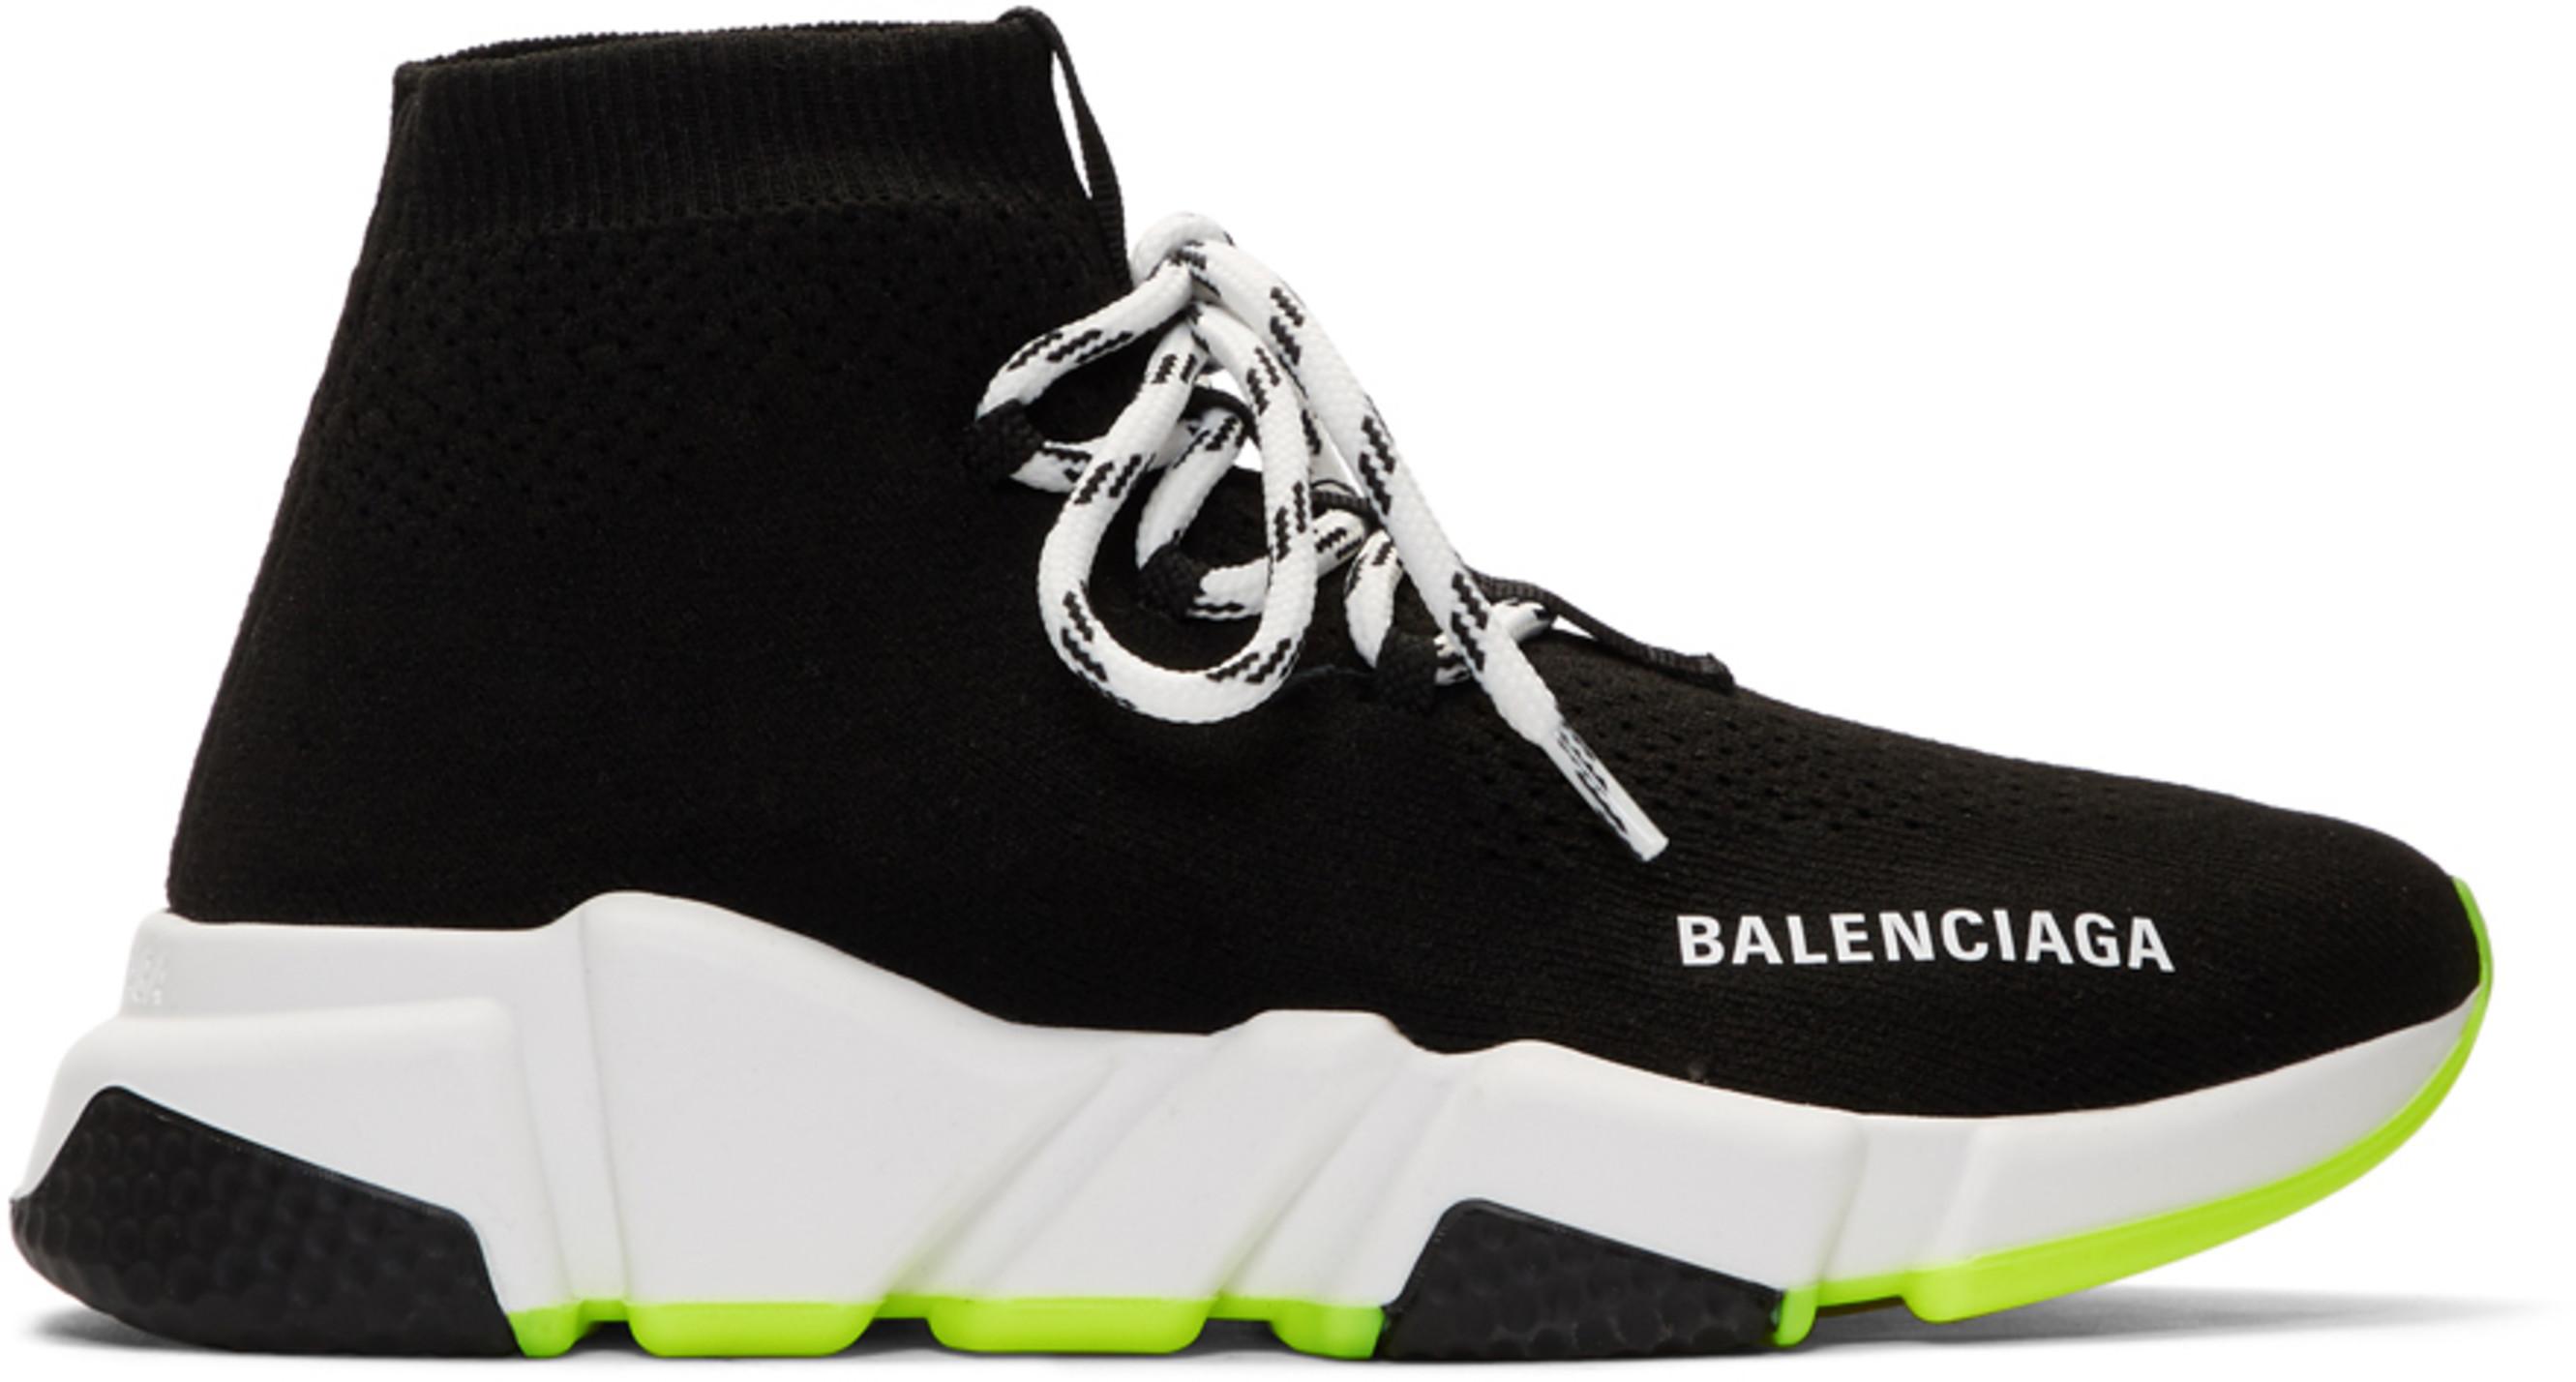 classic fit 1ec1a 49f83 Balenciaga for Women SS19 Collection   SSENSE